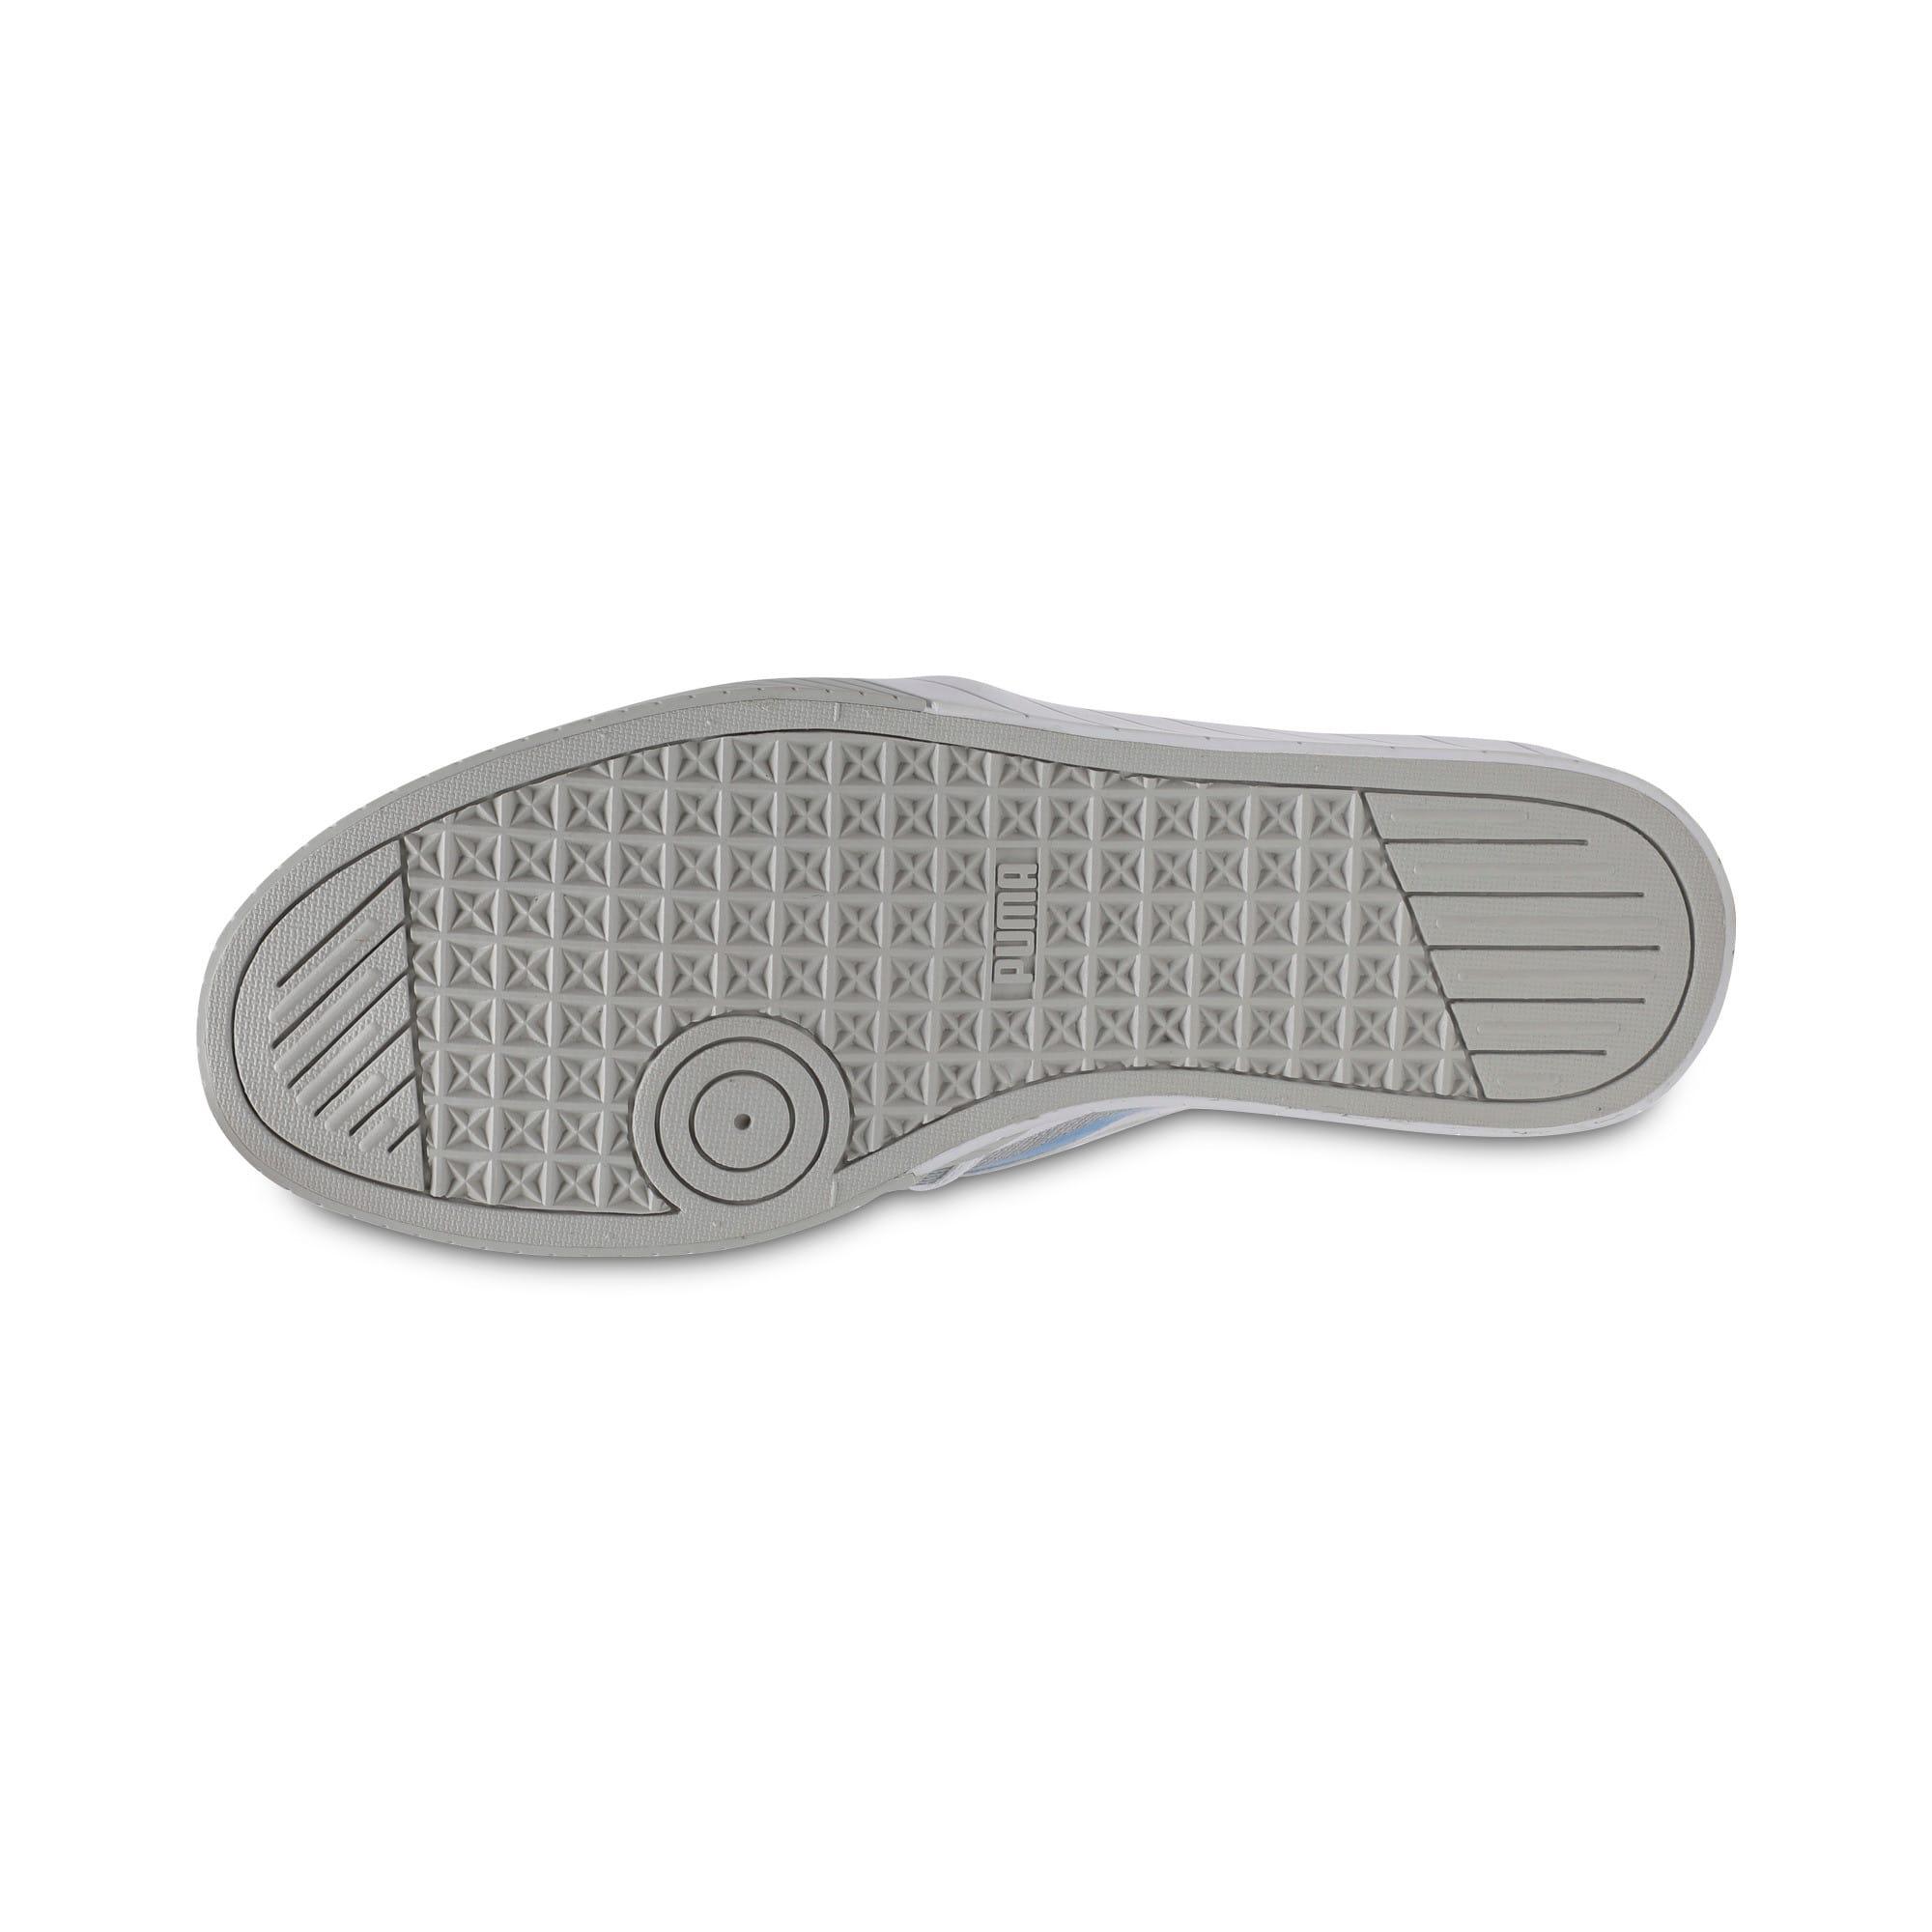 Thumbnail 6 of BMW M Slip-On Track Shoes, Puma White-Gray Violet, medium-IND